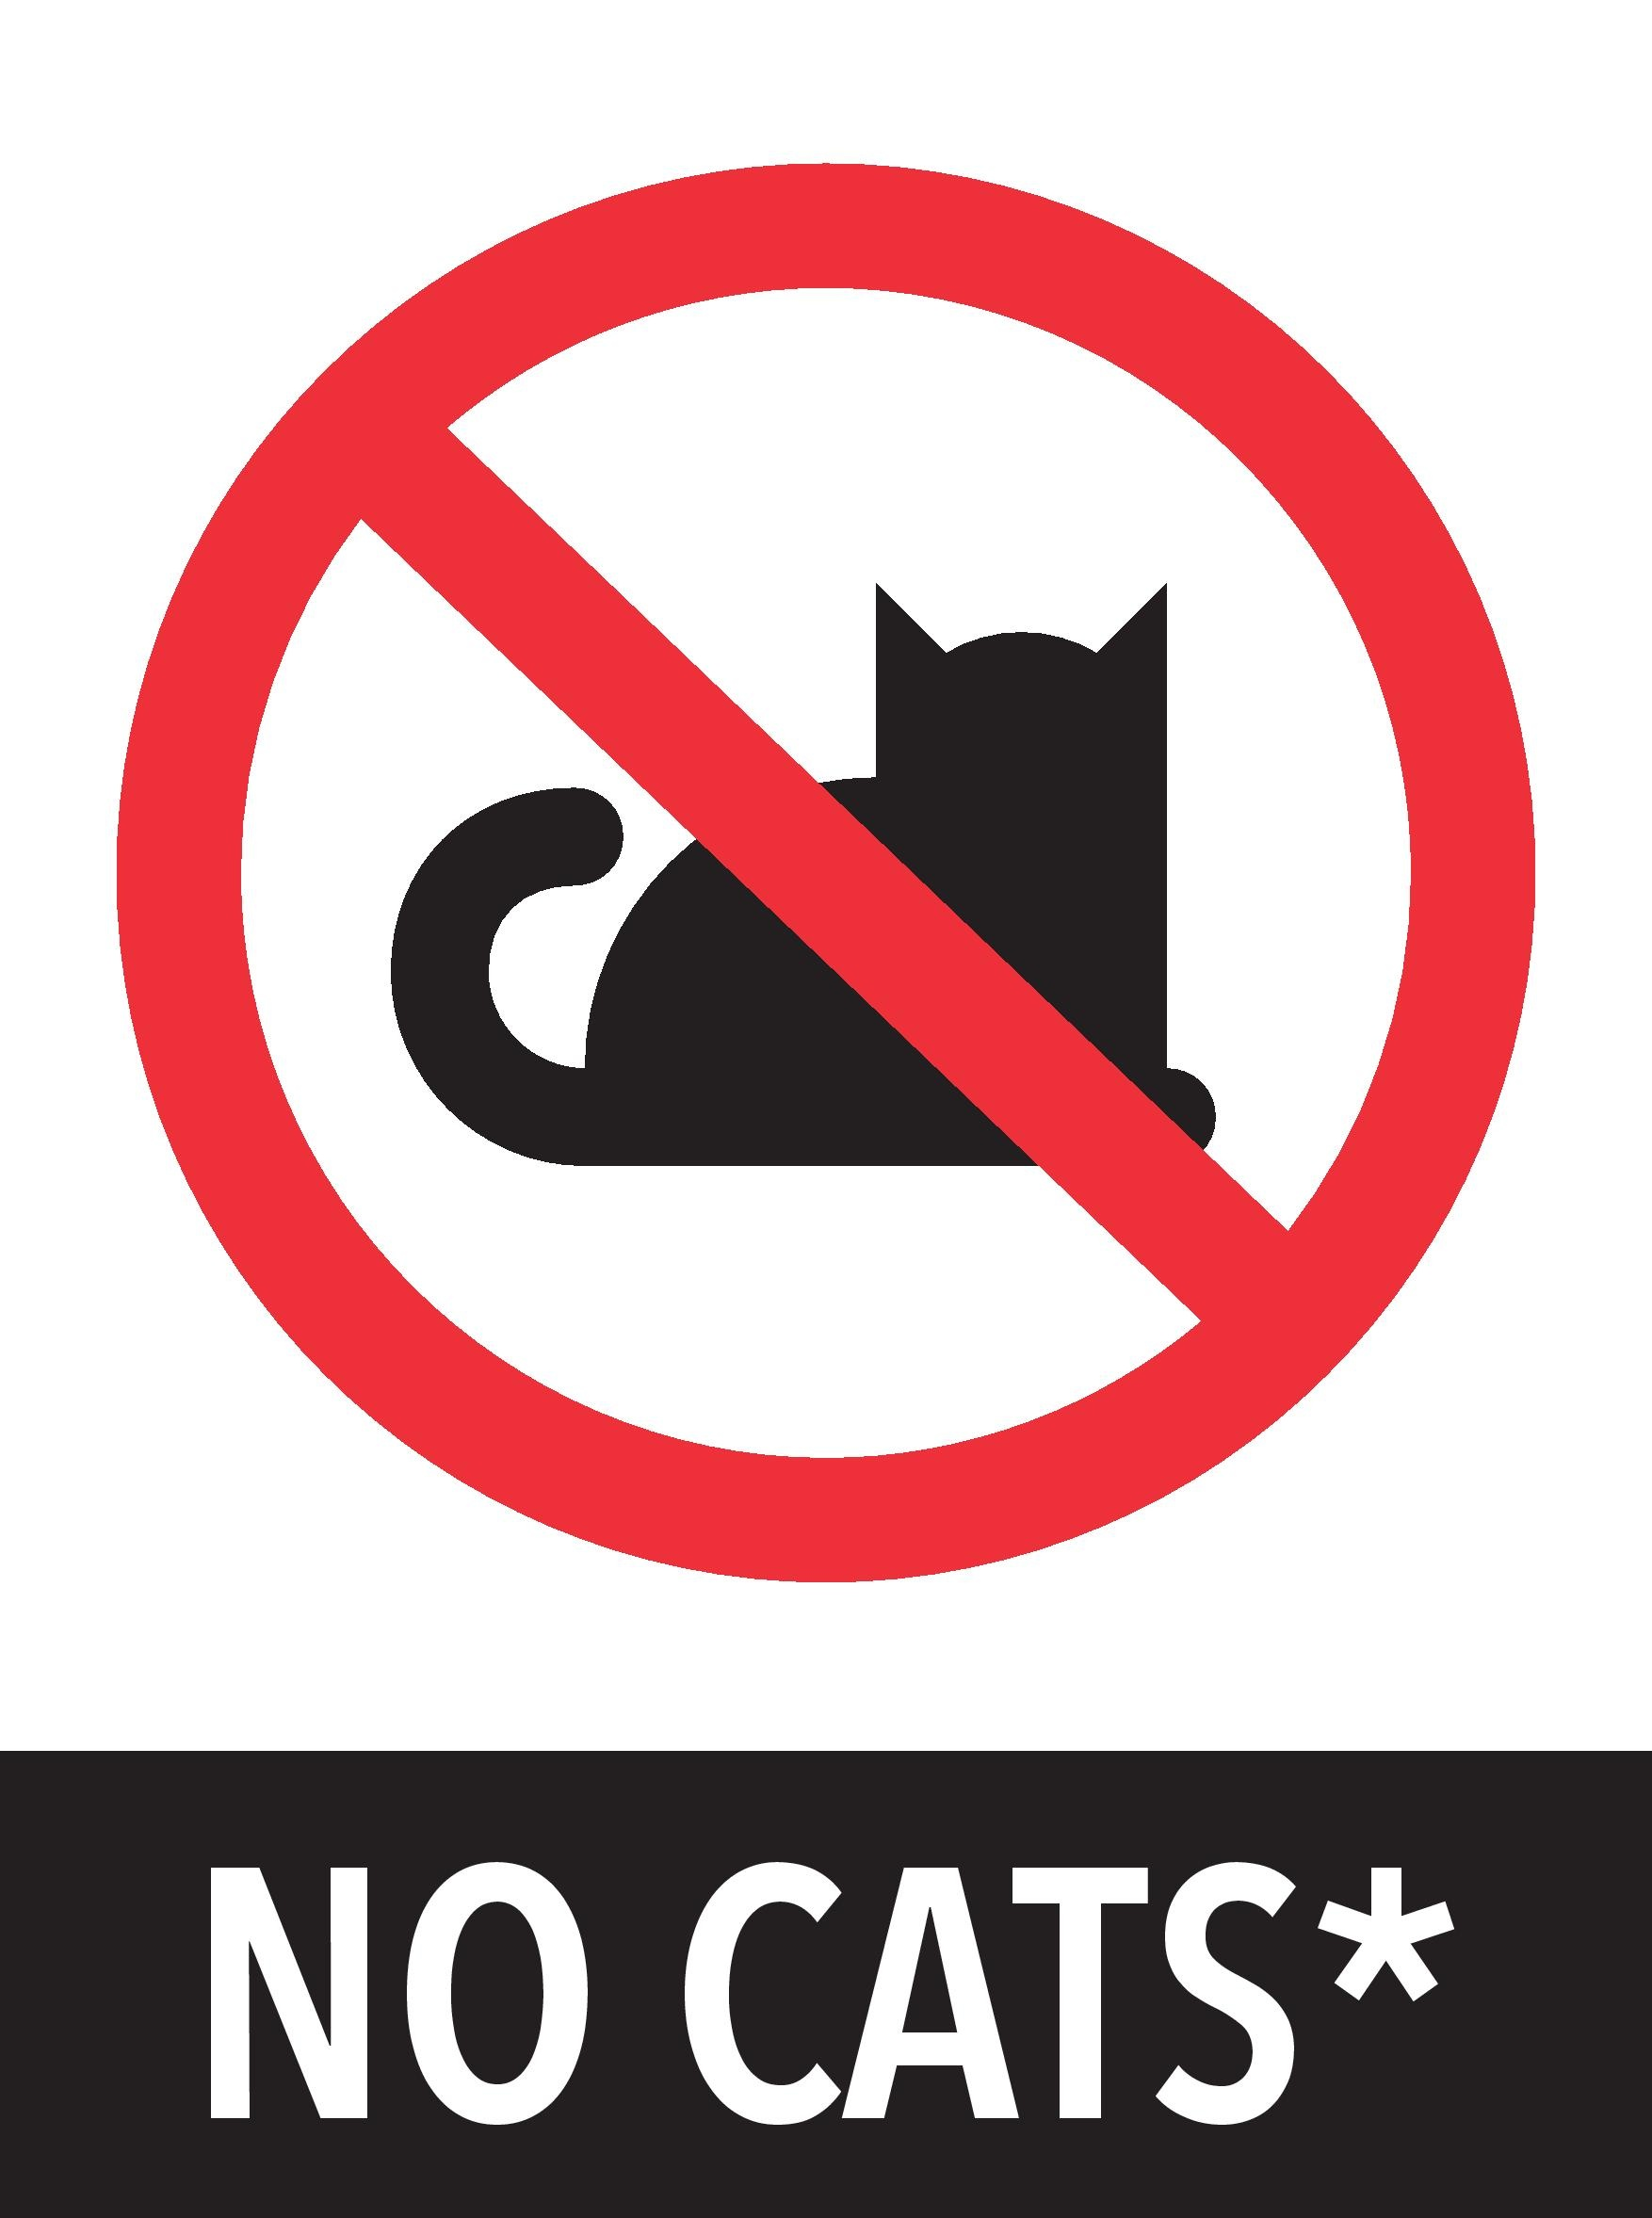 No+cats.jpg